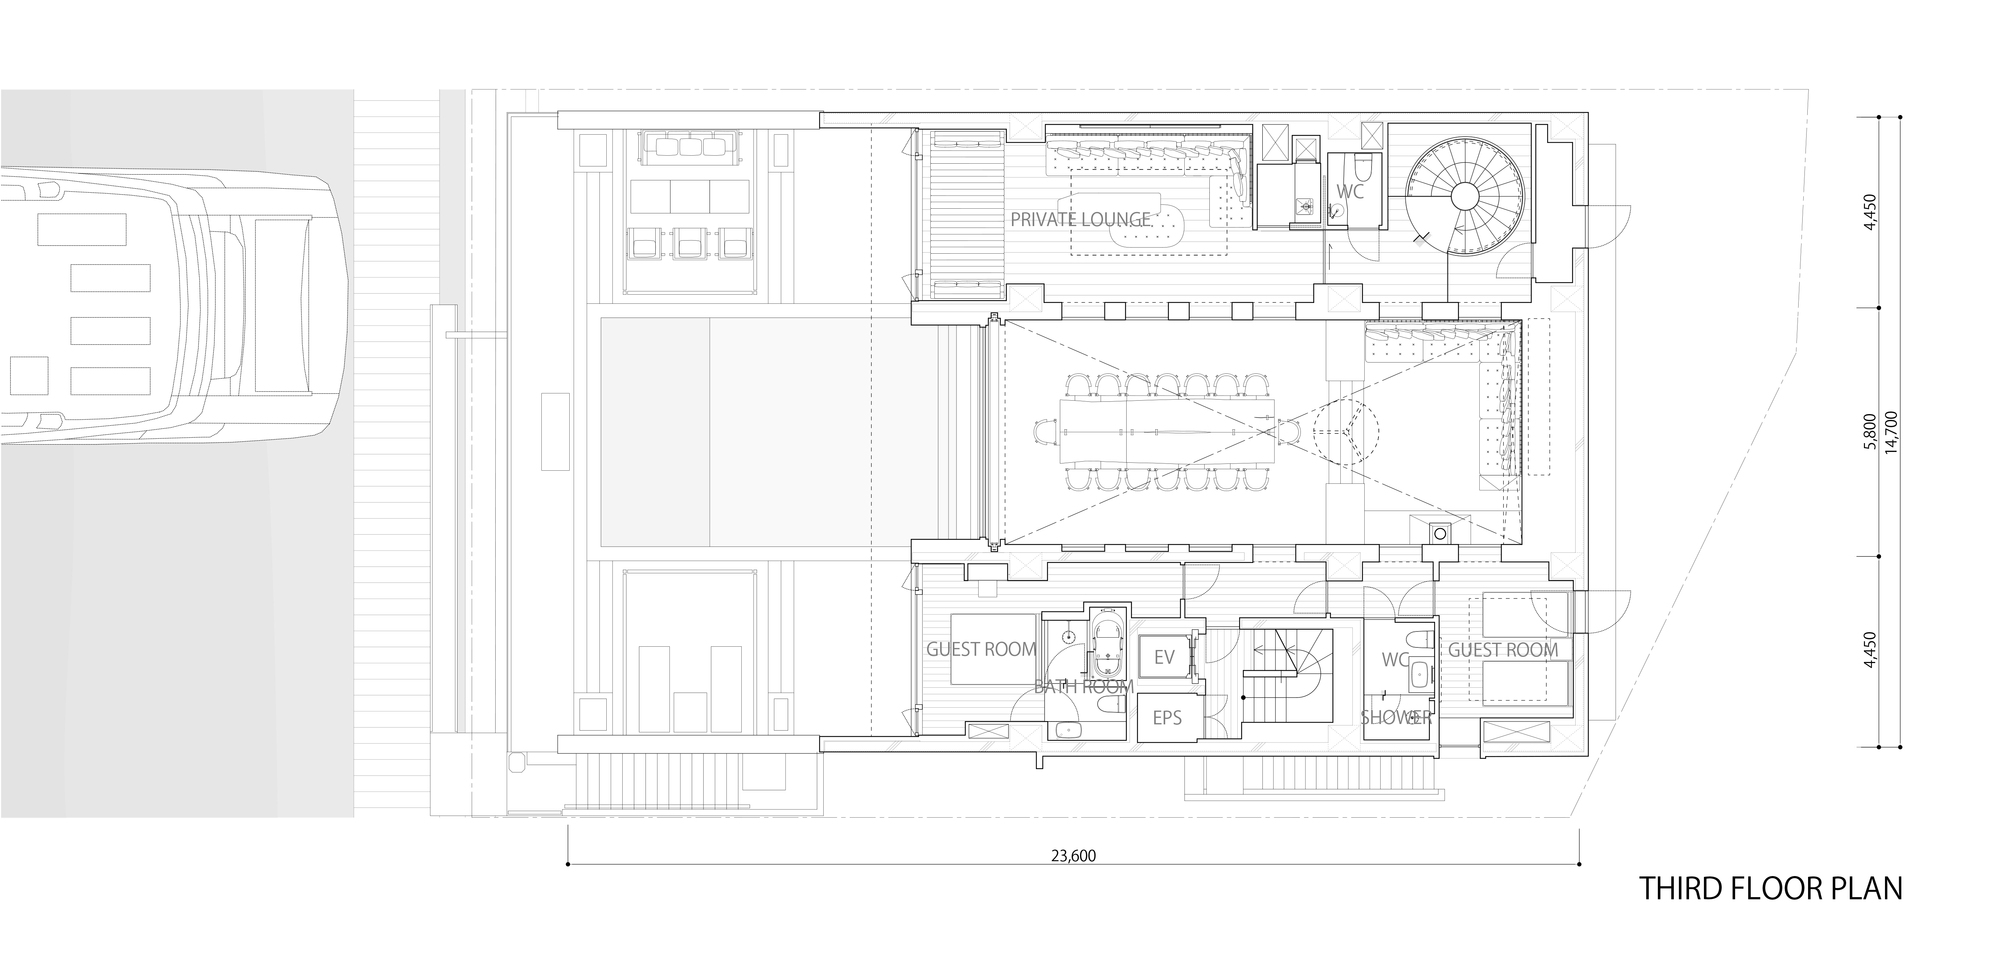 m3 _Loggia_on_the_shore_third_floor_plan.jpg